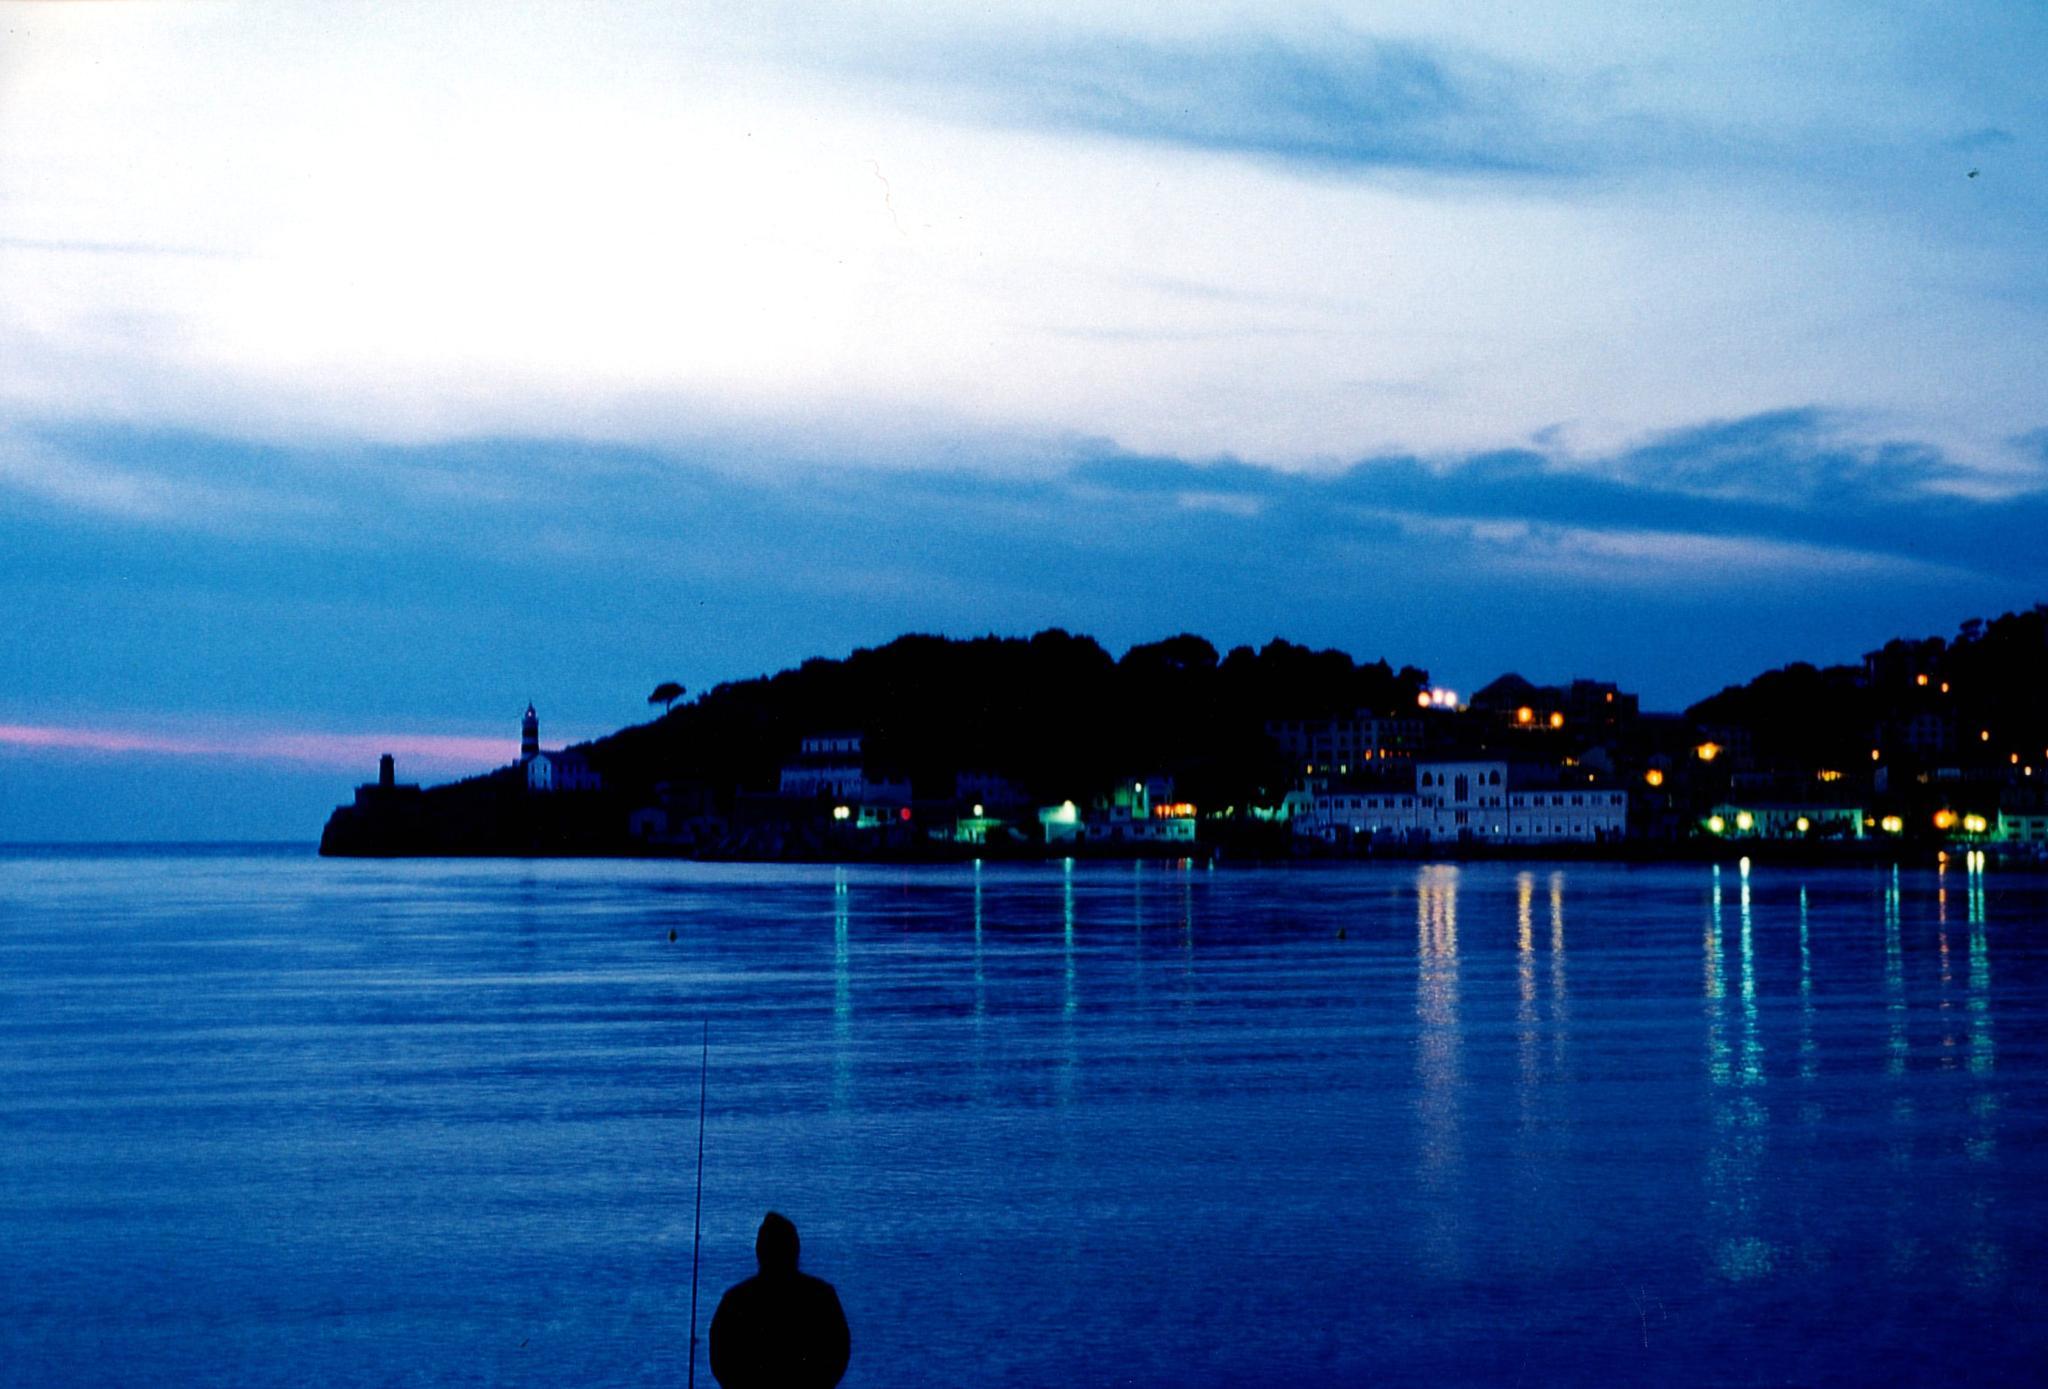 Blue Hour by Detlef F. Rimkus